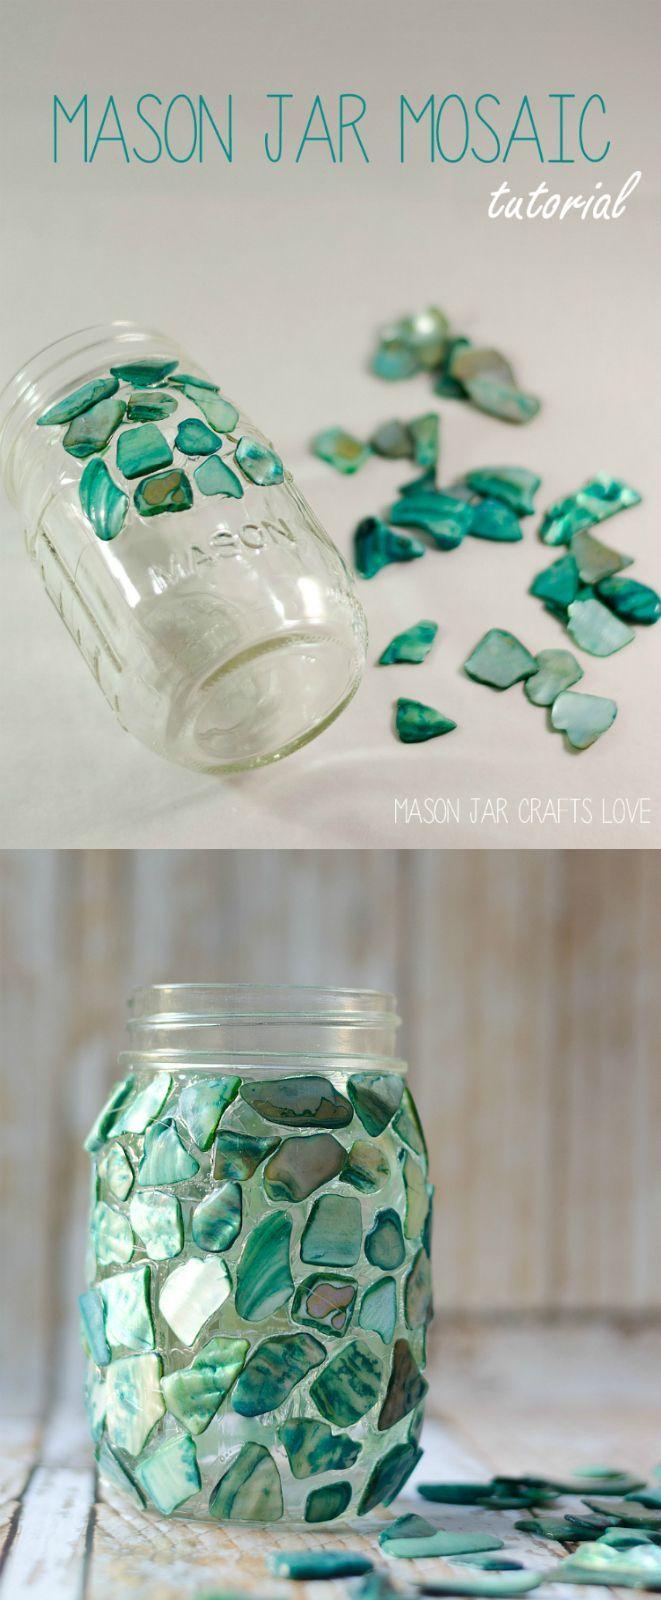 Diy things to do with mason jars